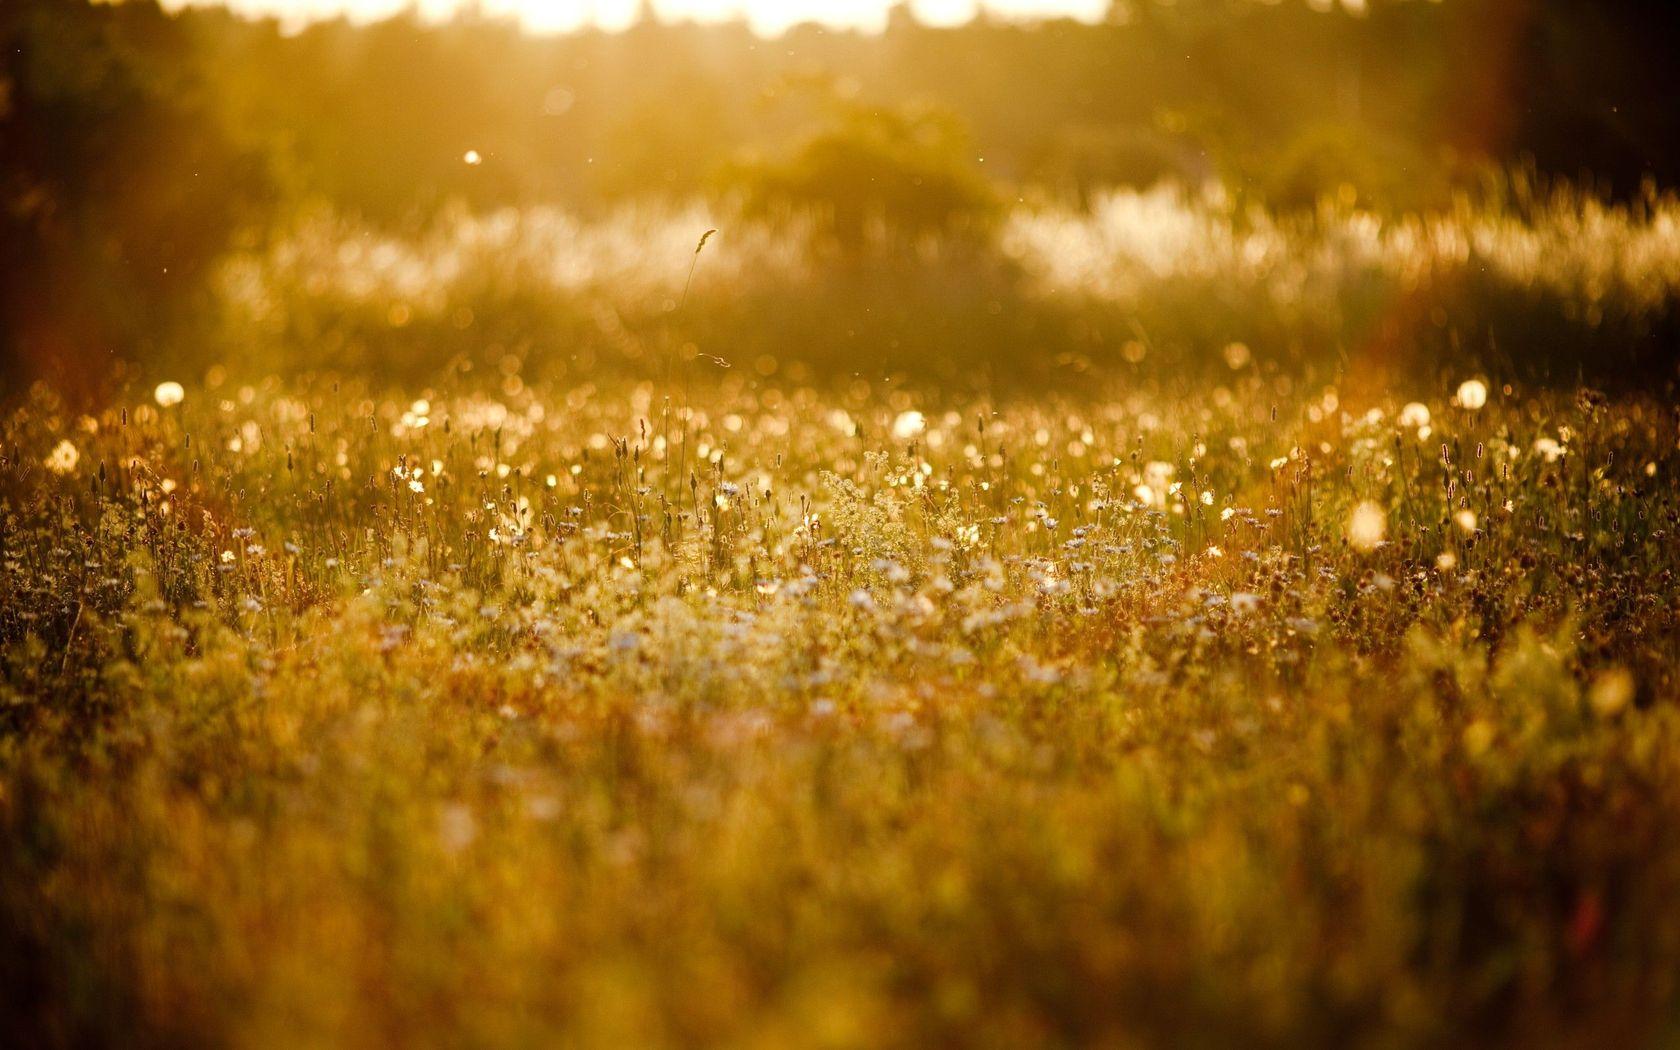 field-of-flowers-in-the-summer-light-16776